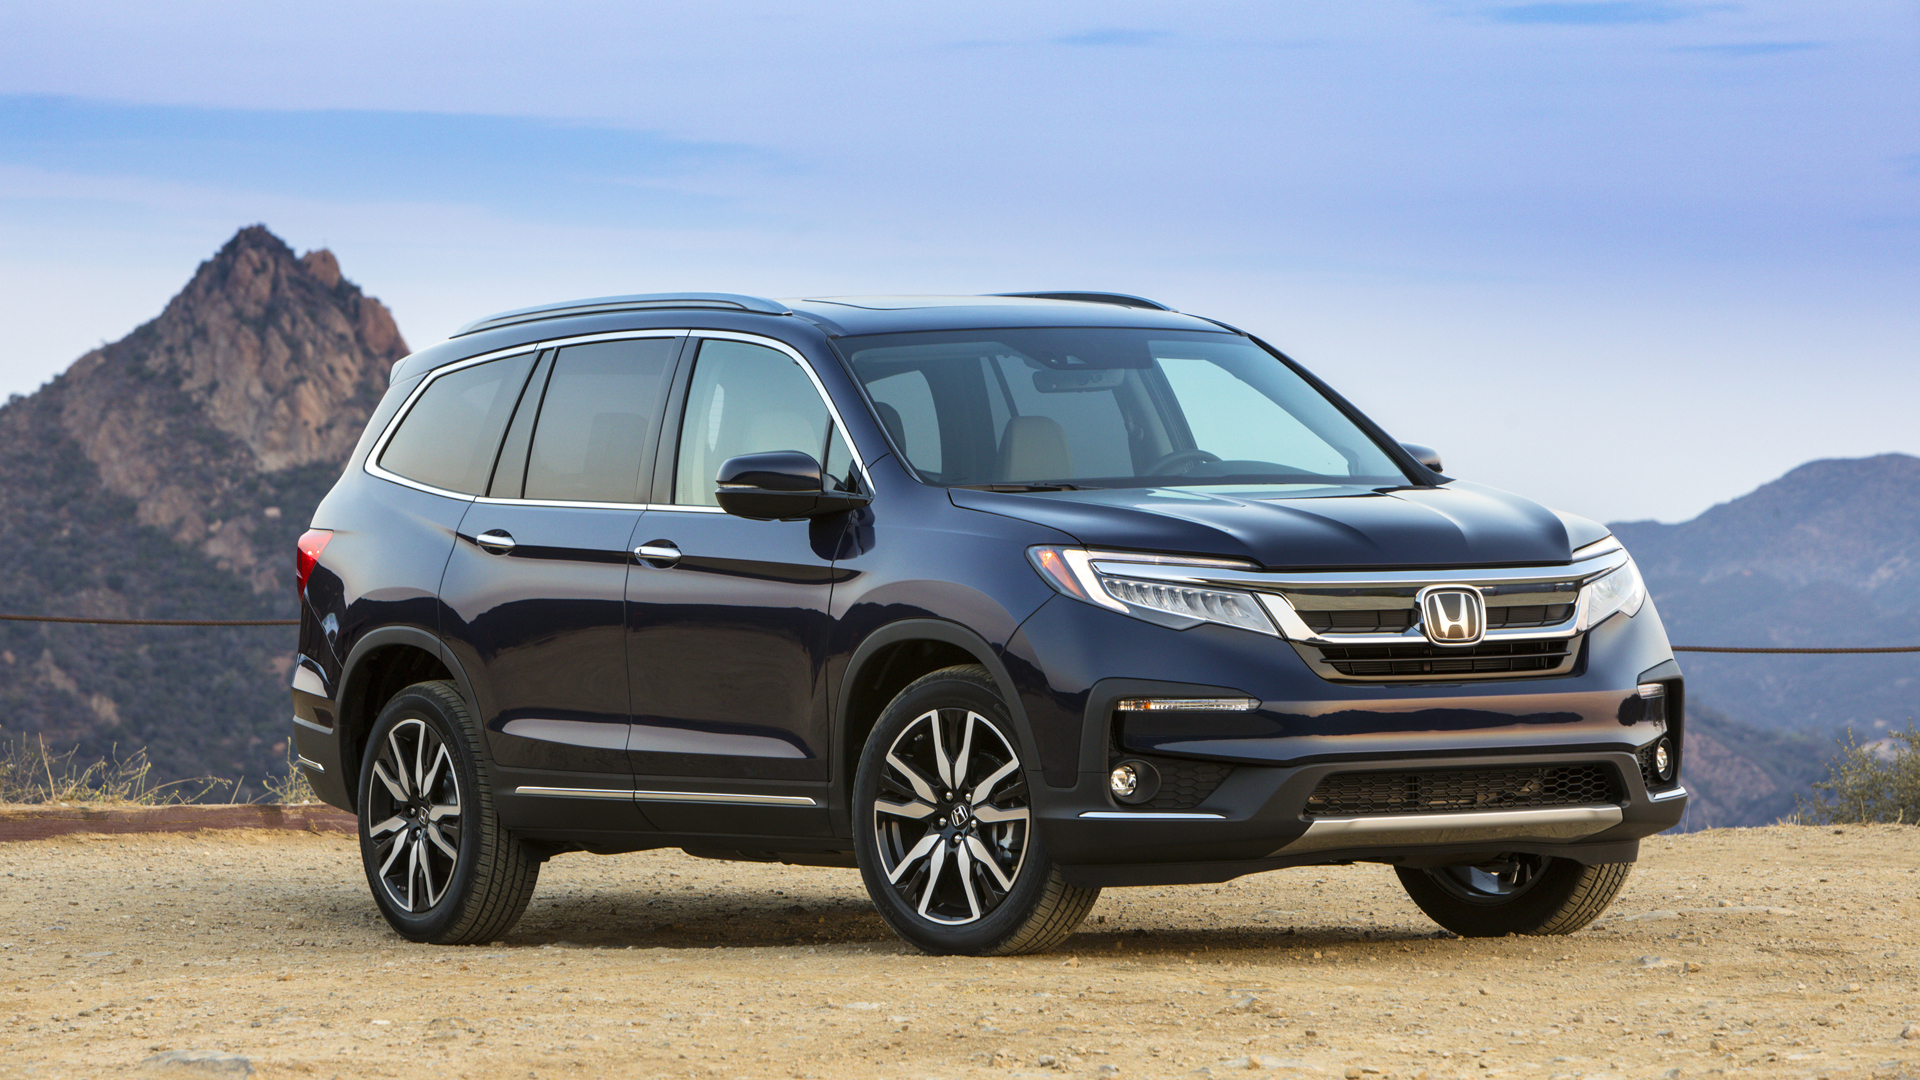 New Model and Performance Honda Pilot 2021 Hybrid